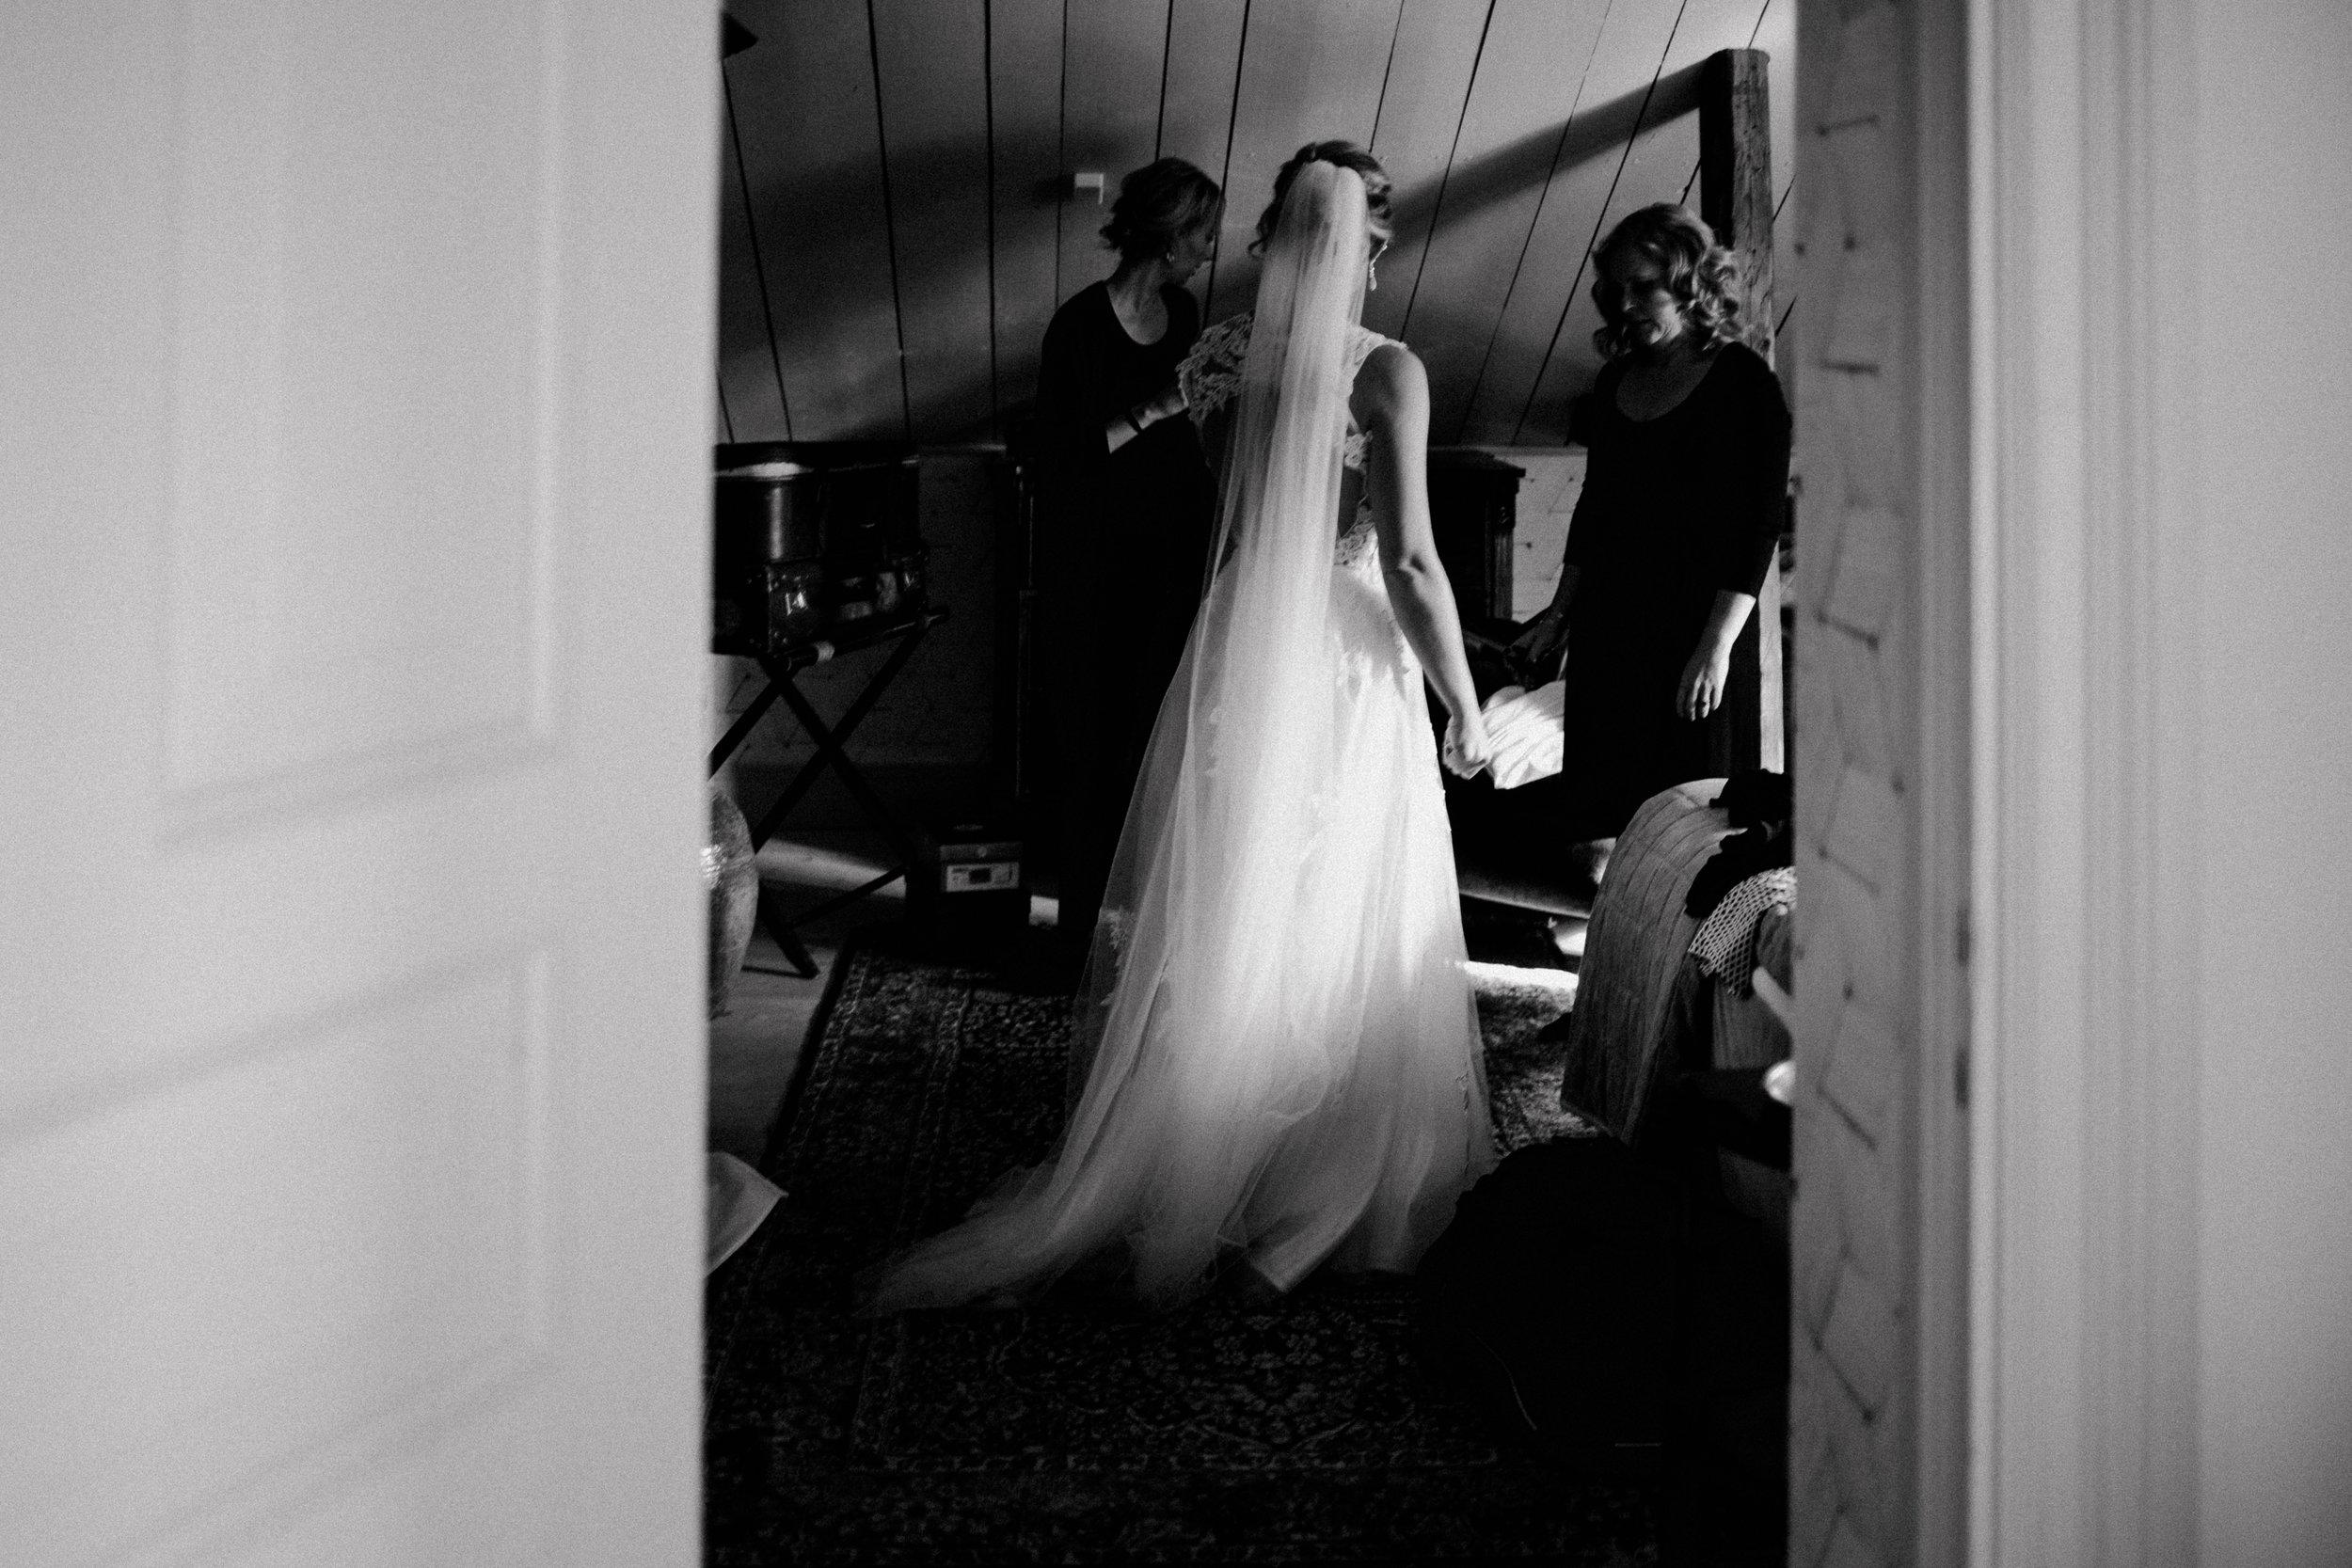 Bröllopsfotograf-Uddetorp Säteri-Höstbröllop-Fotograf Emilia- Bröllopsfotograf Borås-6.jpg